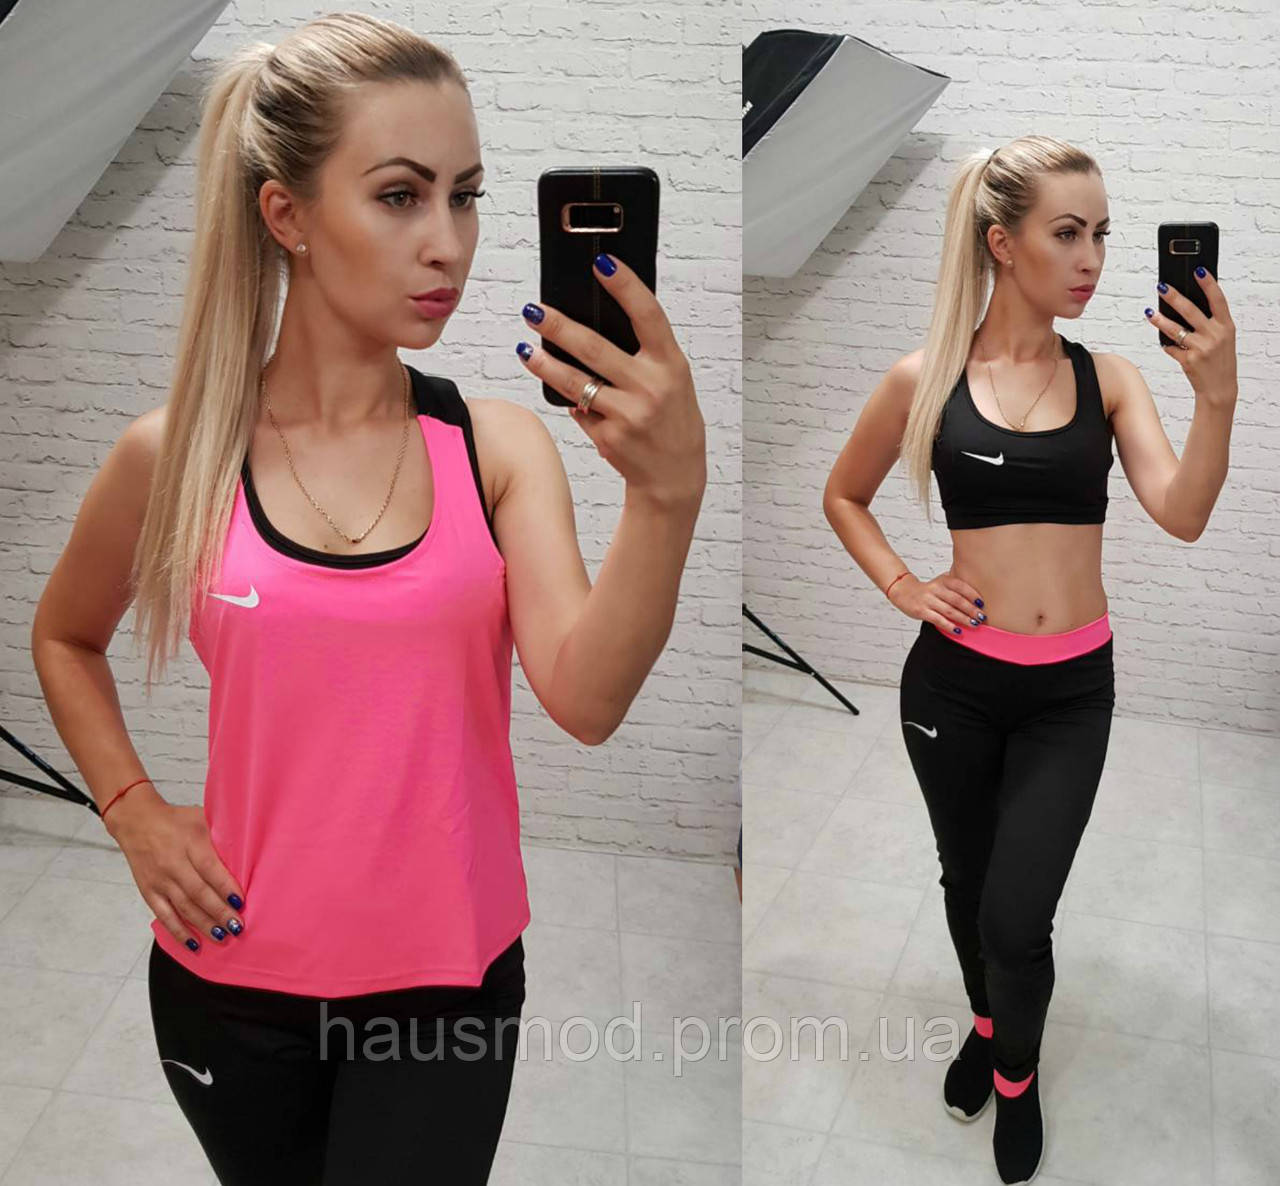 Фитнес костюм 3-ка реплика Nike топ майка лосины микро дайвинг розовый